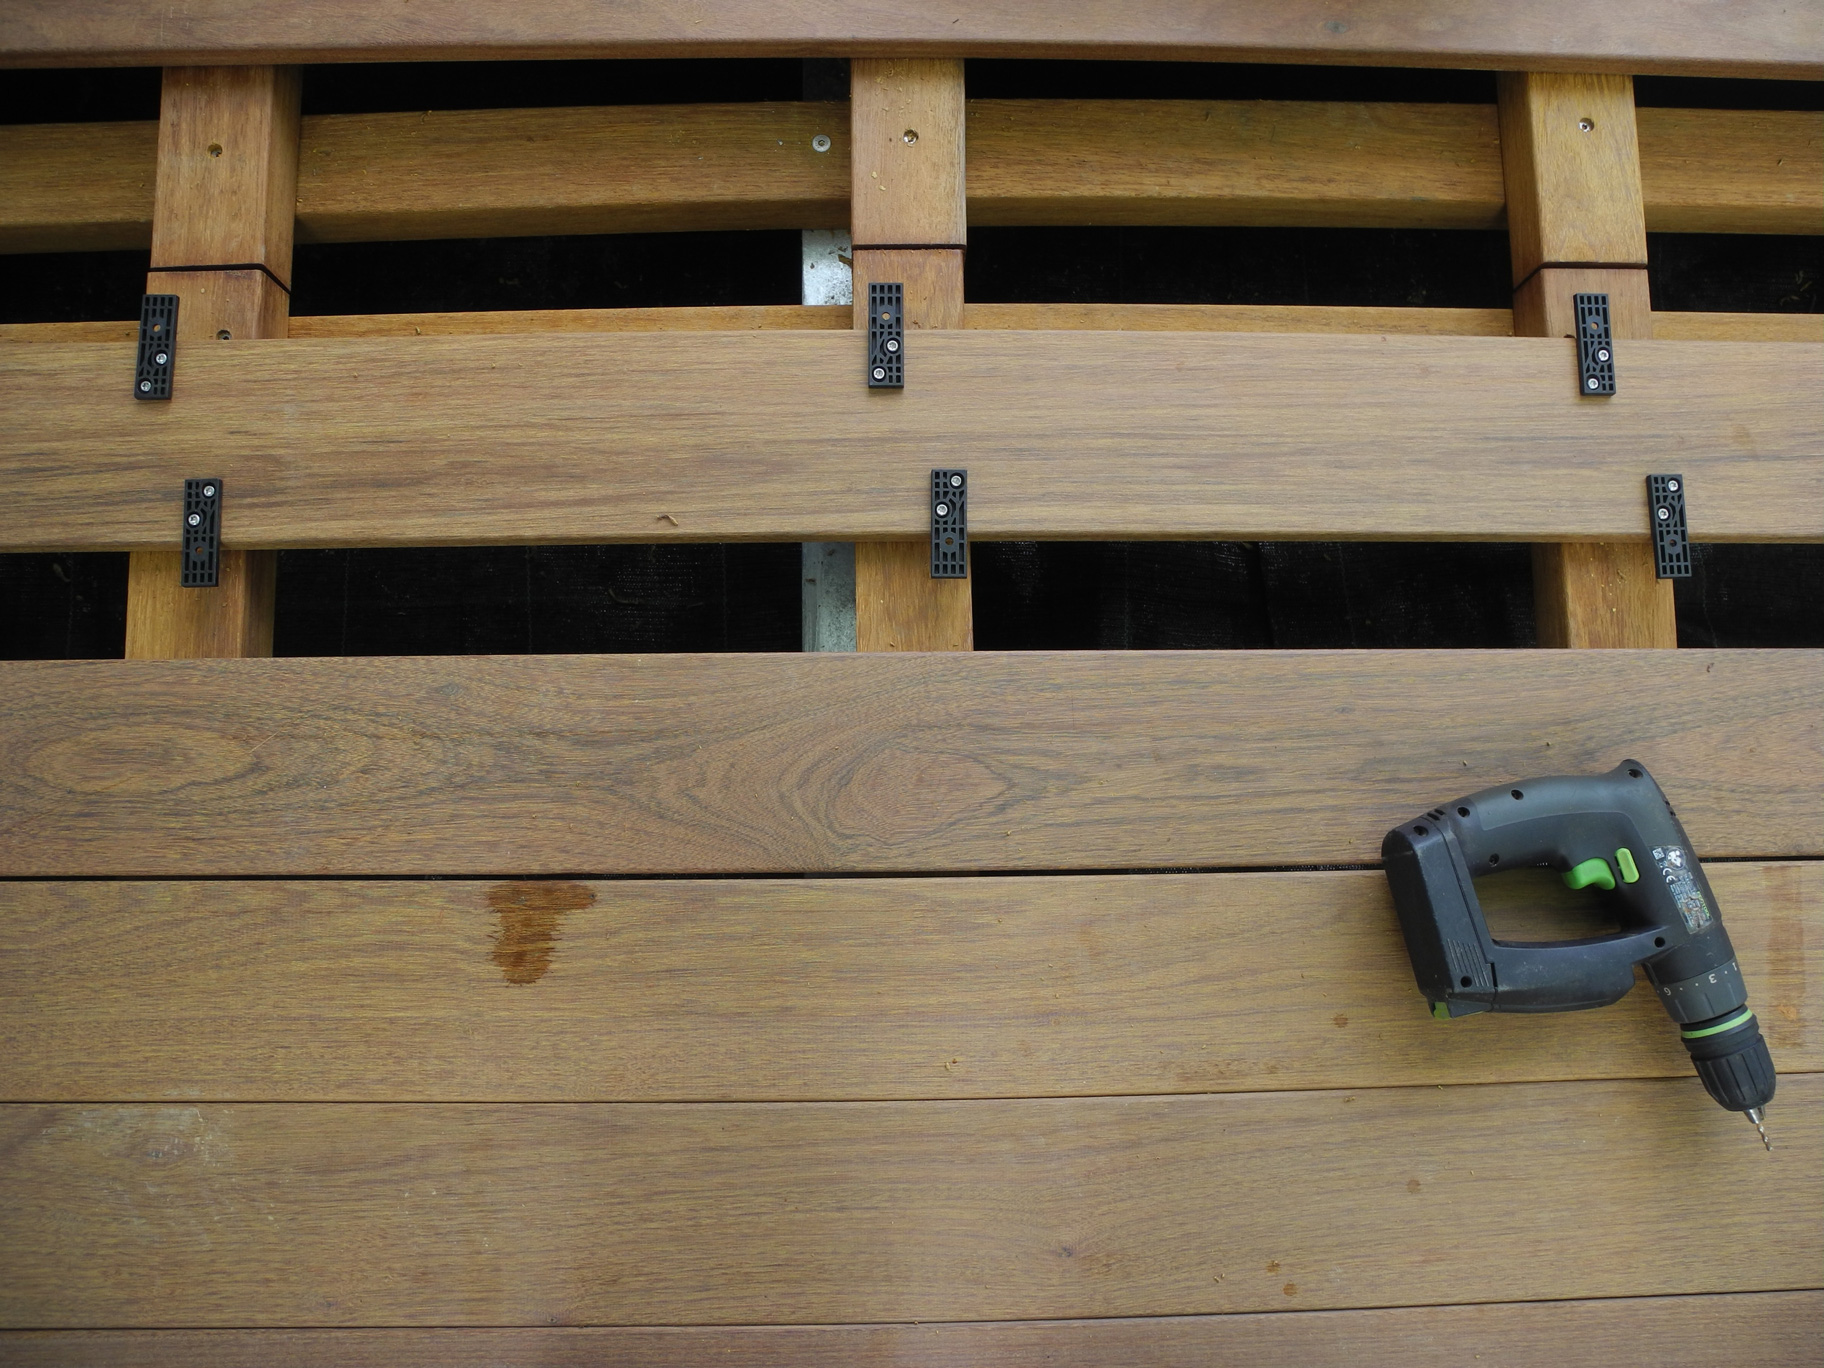 verdeckte befestigung thermostat dusche bar ventil verdeckte befestigung fitting wandplatte kit. Black Bedroom Furniture Sets. Home Design Ideas